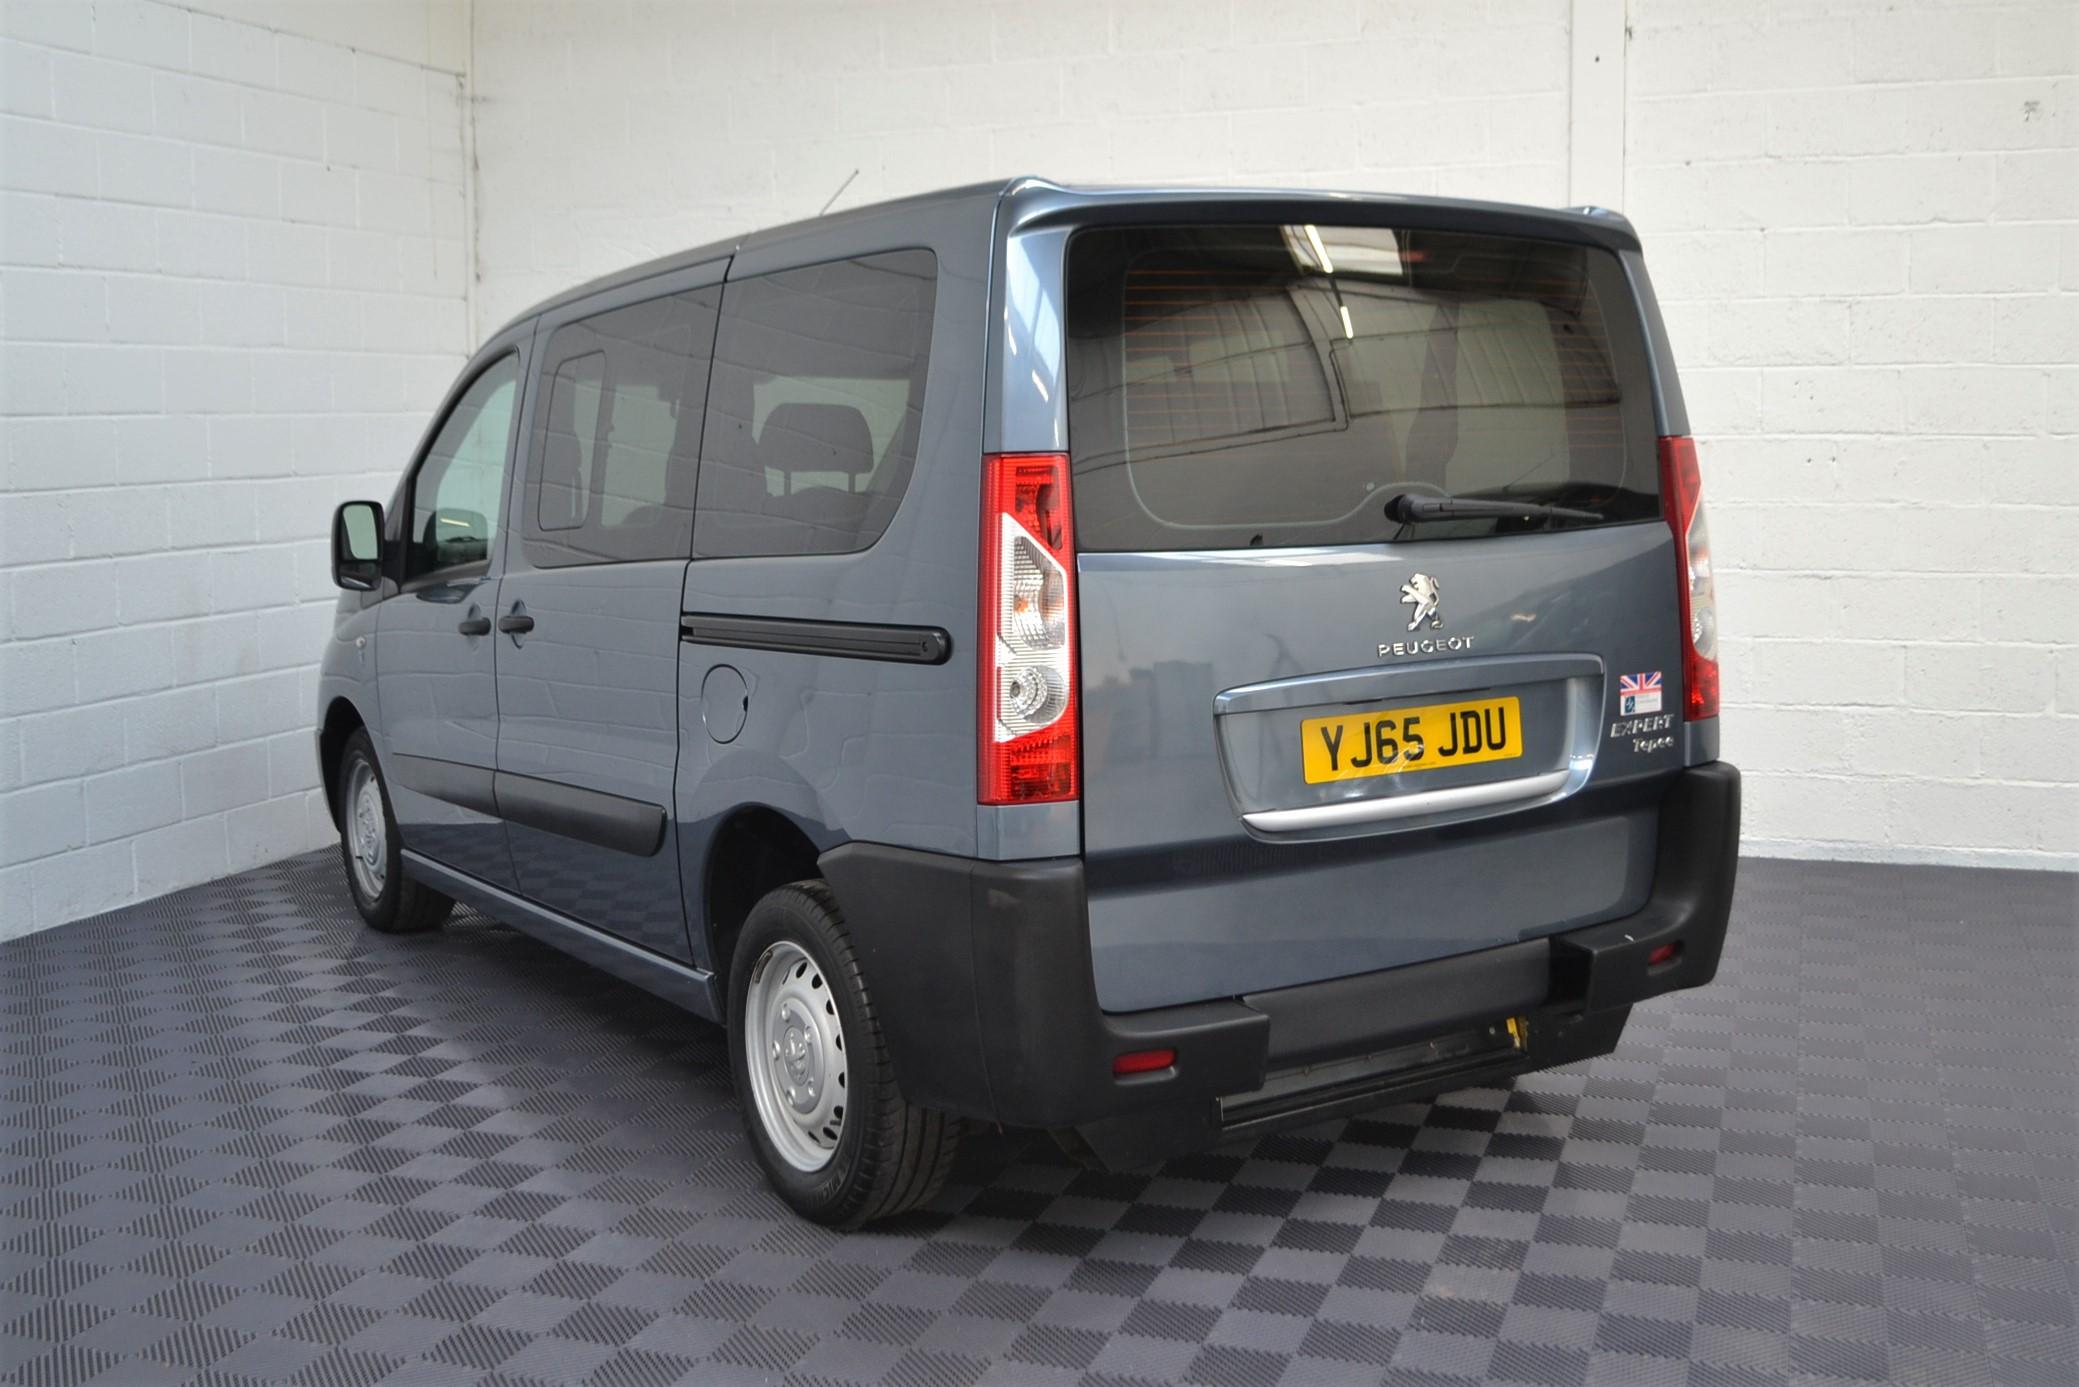 WAV Cars For Sale Bristol Wheelchair Accessible Vehicles Used For Sale Somerset Devon Dorset Bath Peugeot Expert YJ65 JDU 3